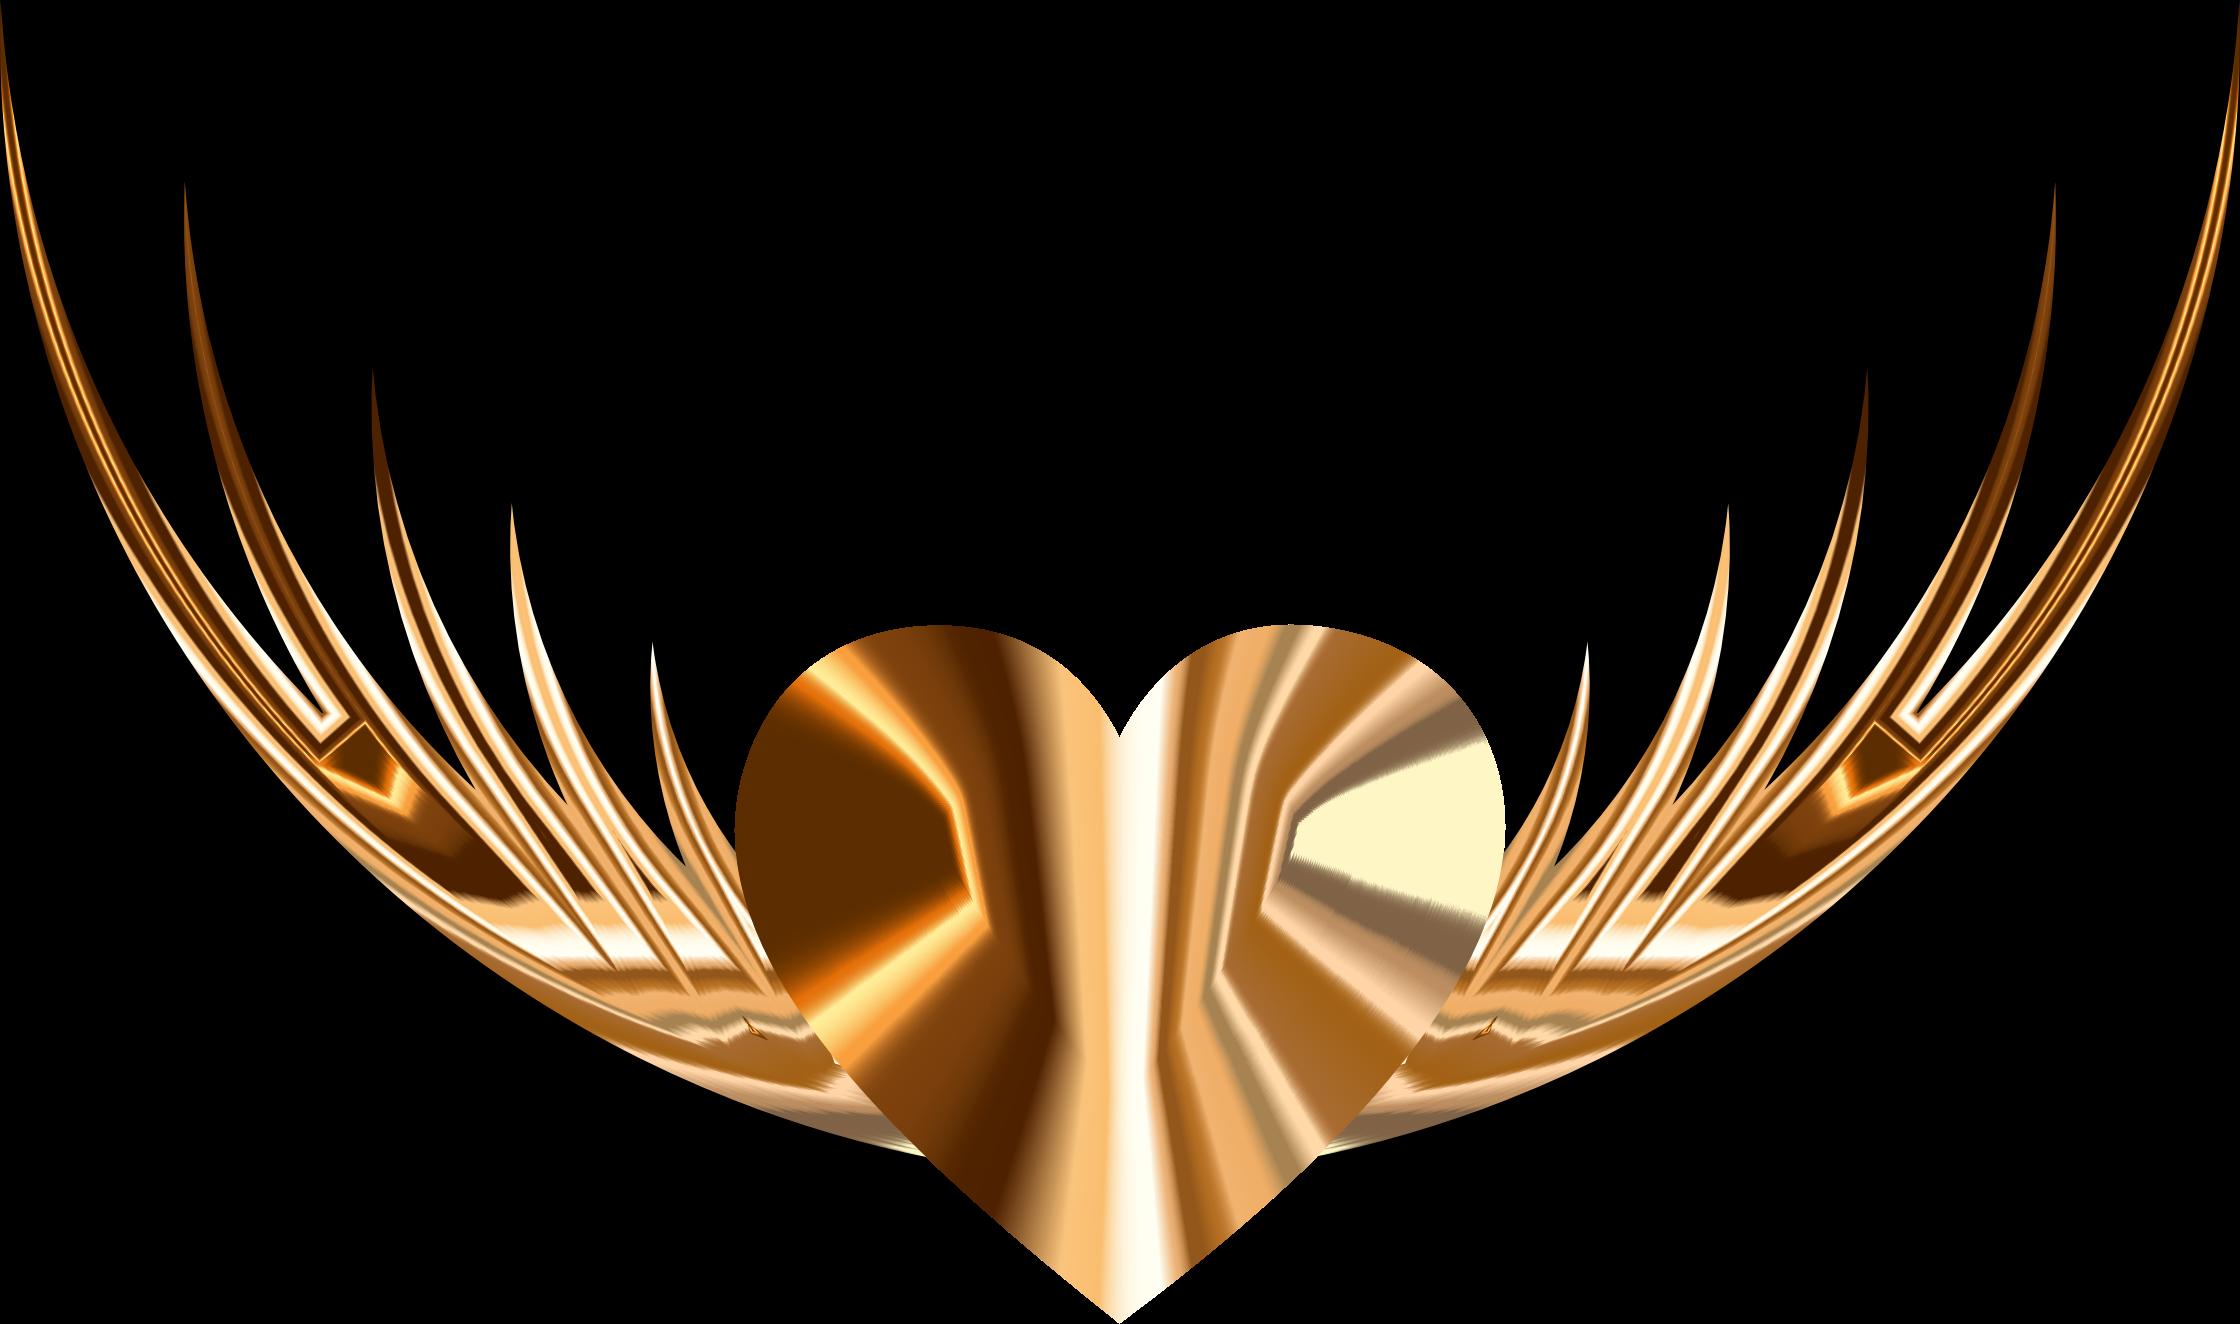 Flying heart clipart clip art freeuse stock Clipart - Flying Heart 6 clip art freeuse stock